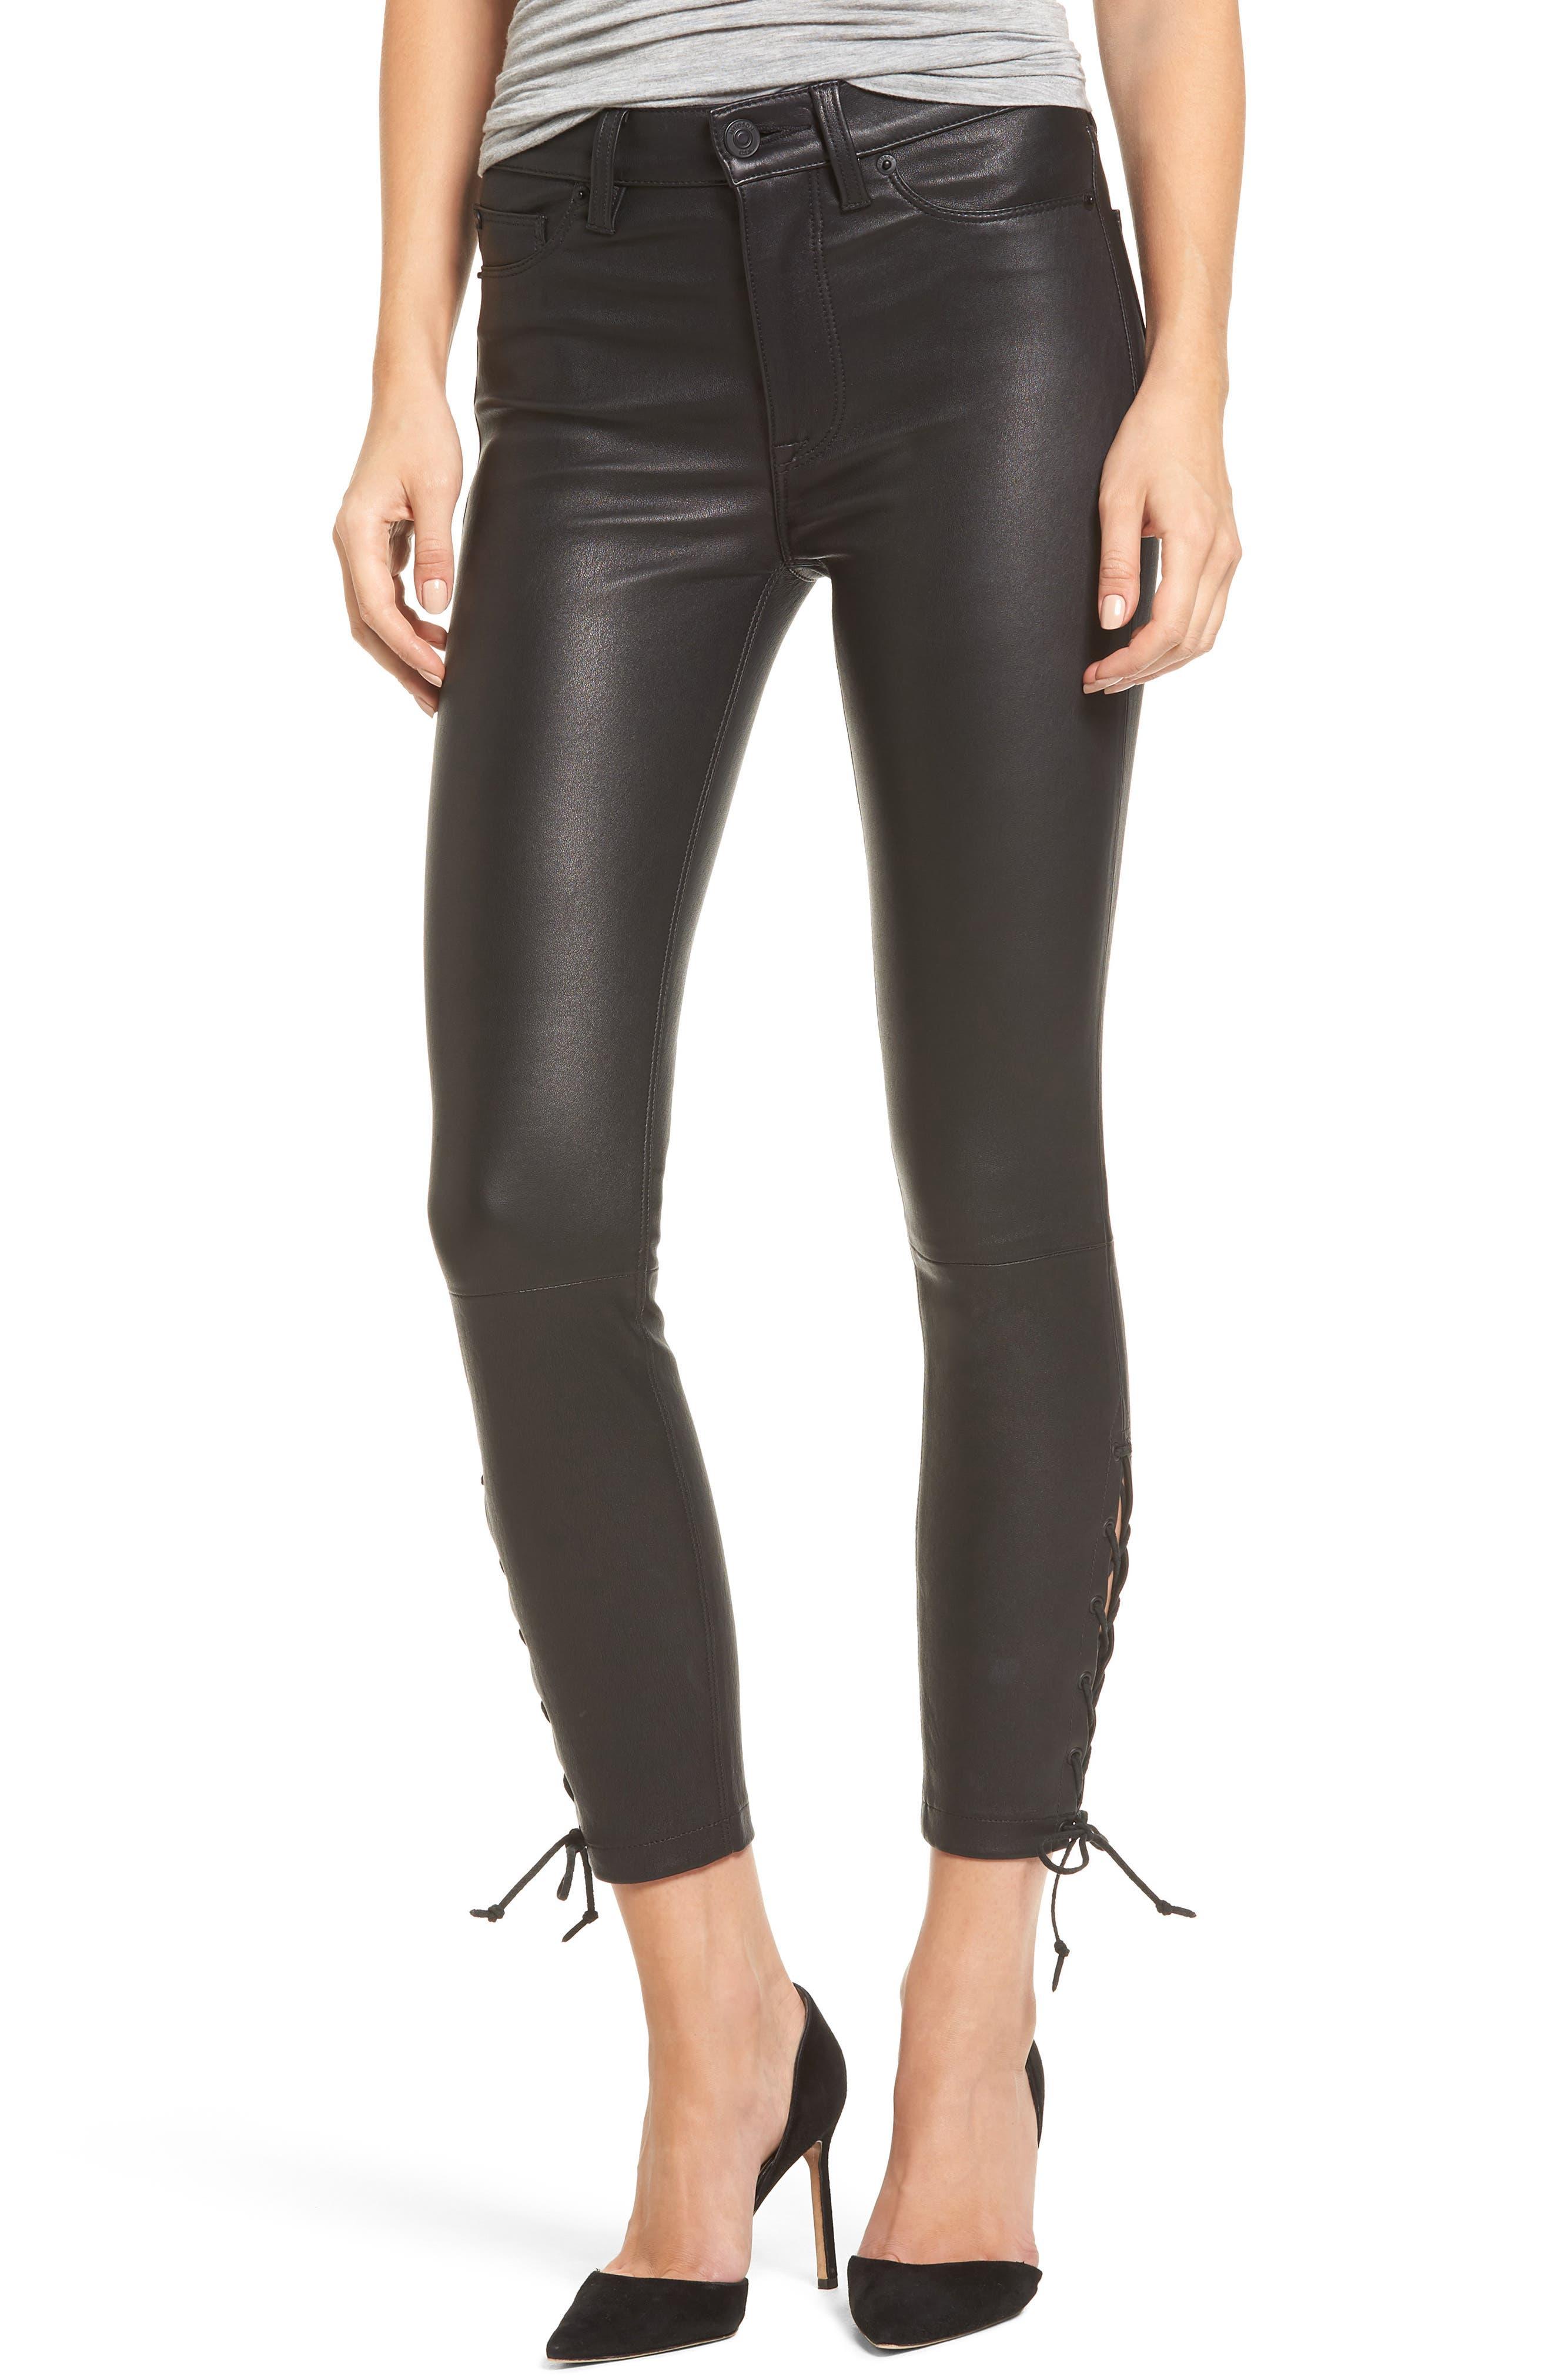 Nix High Waist Leather Skinny Pants,                             Main thumbnail 1, color,                             Black